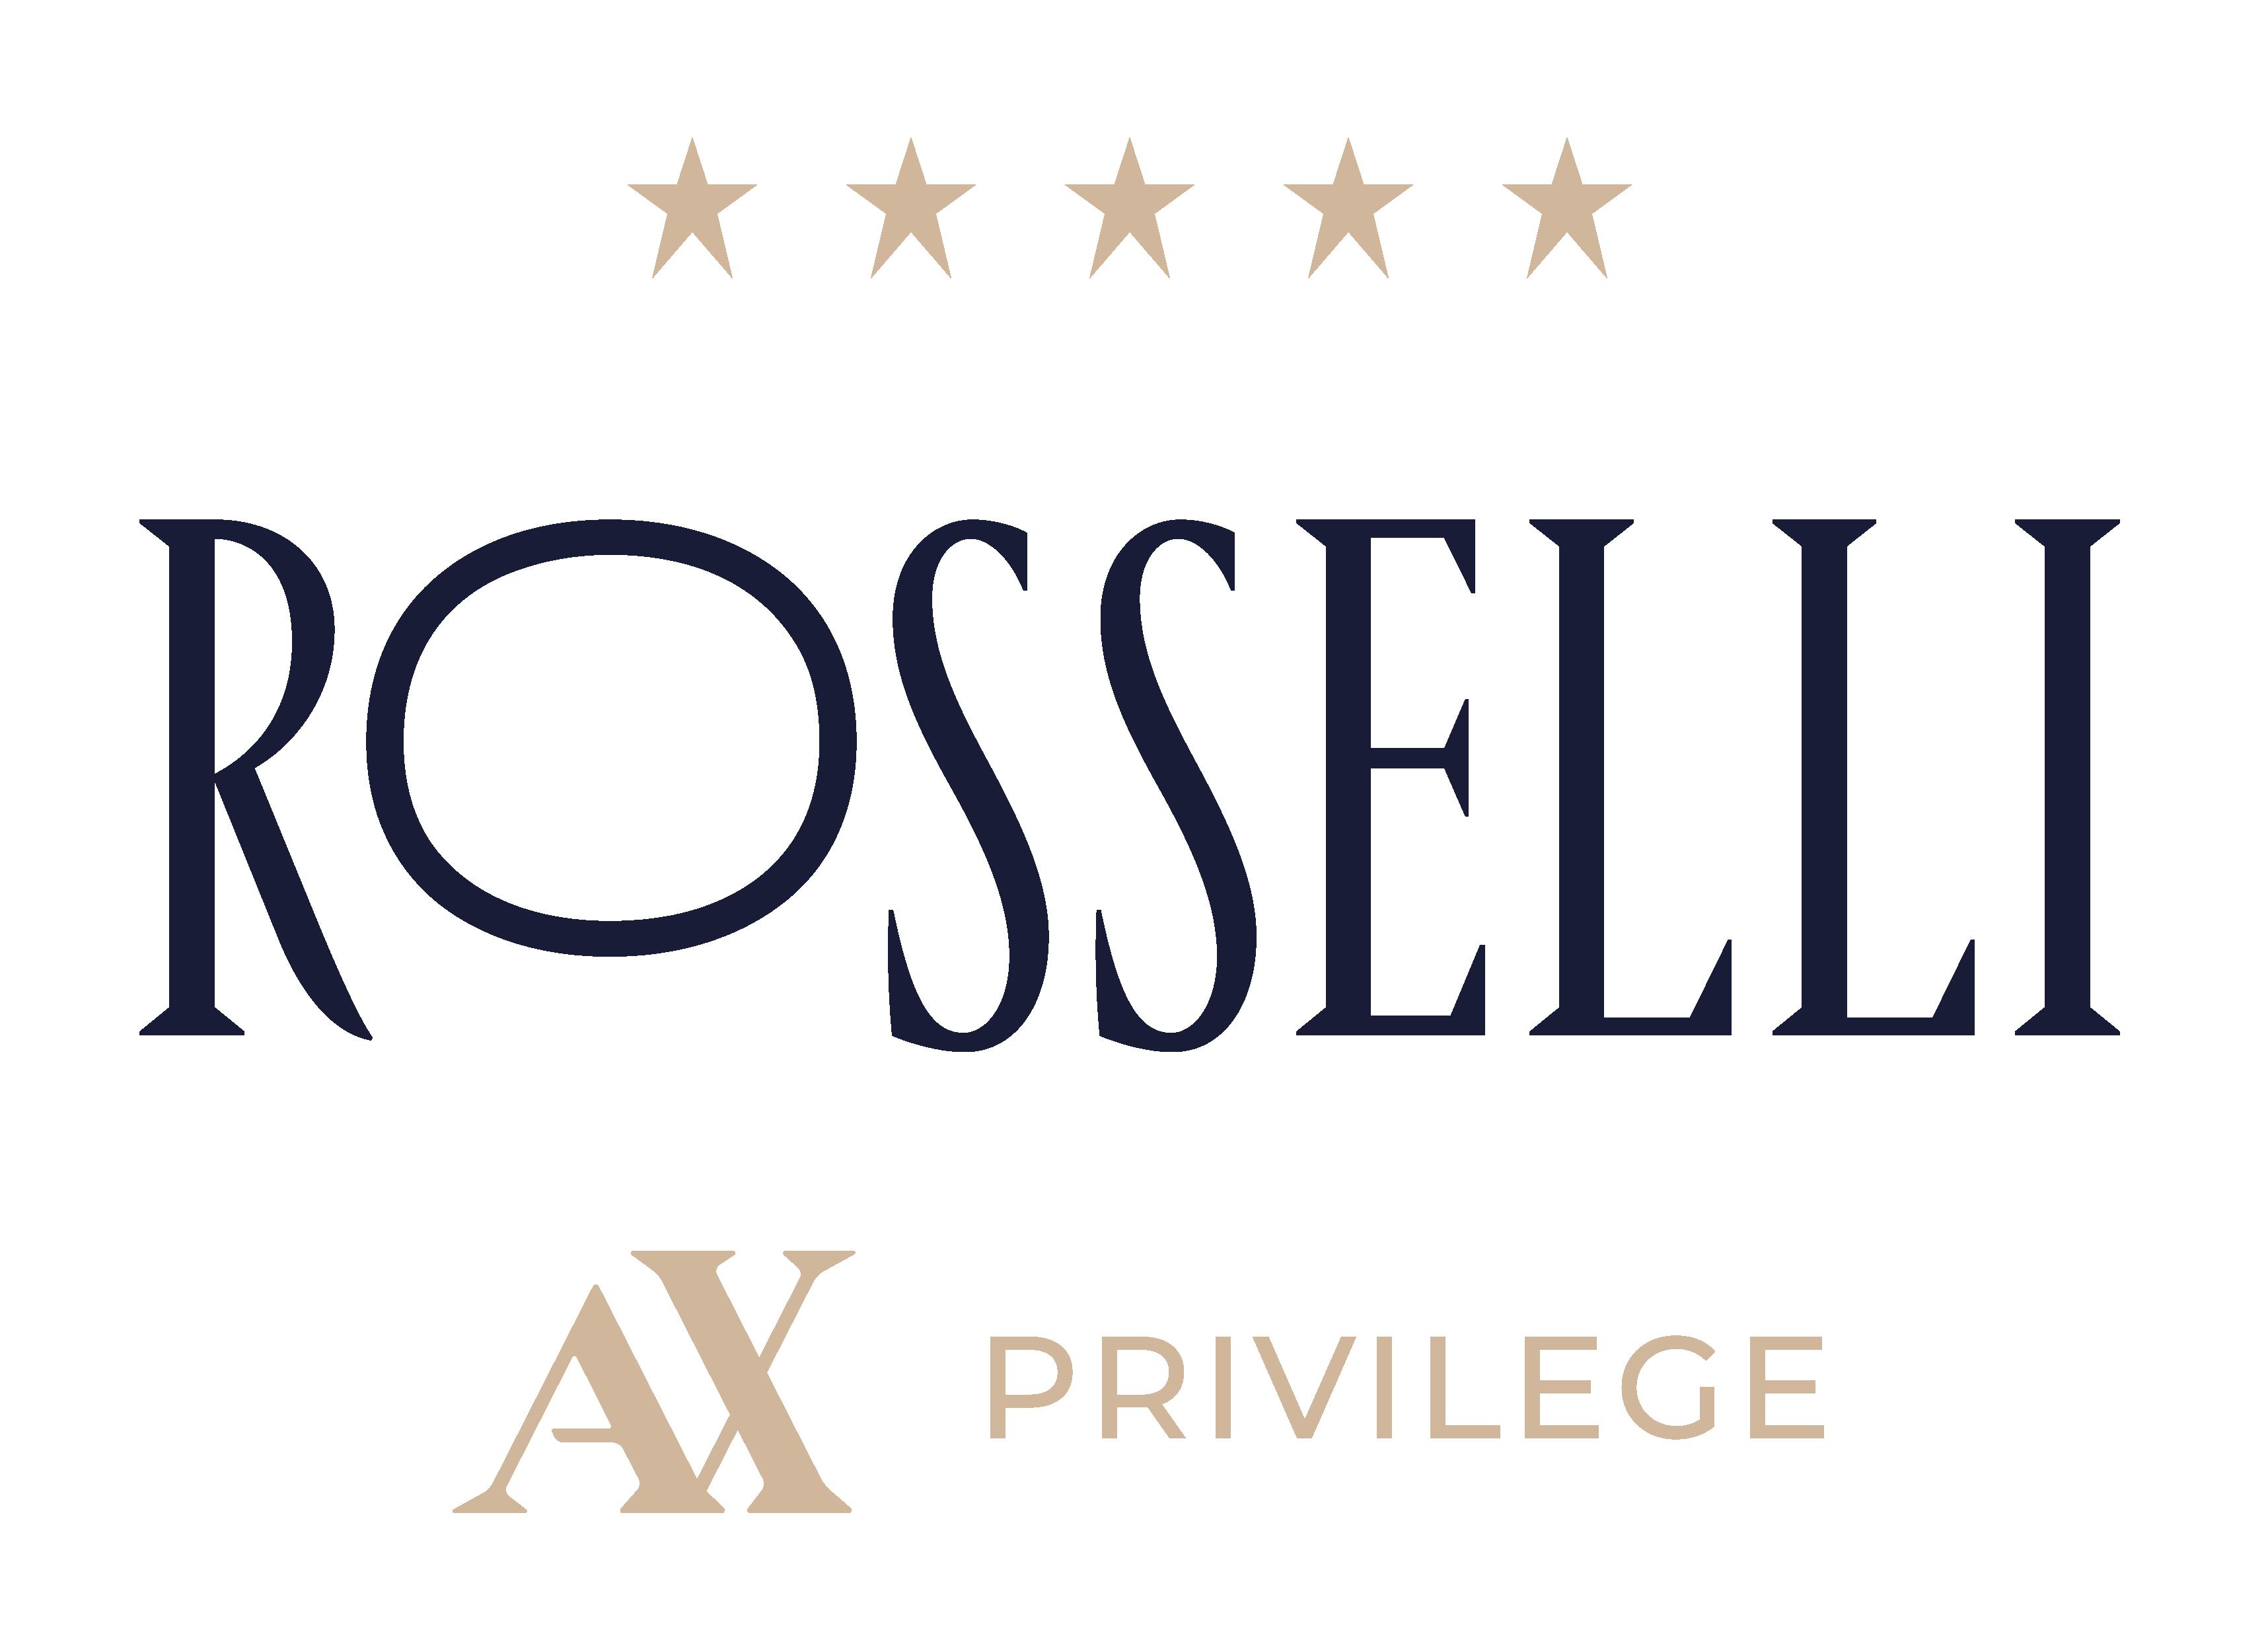 ax, rosselli,  malta, hotel, accommodation, gay, lgbt, stay valletta